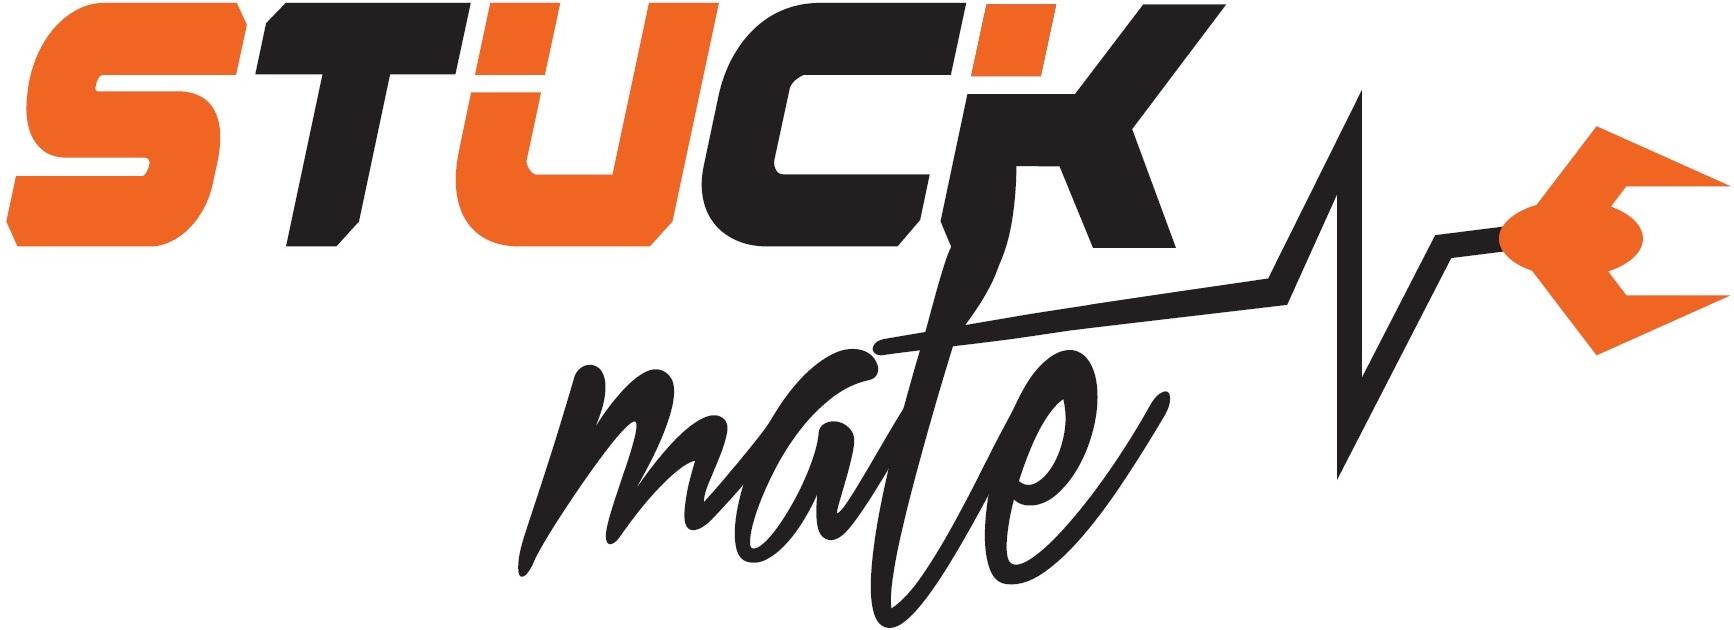 Logo Stuckmate Orange